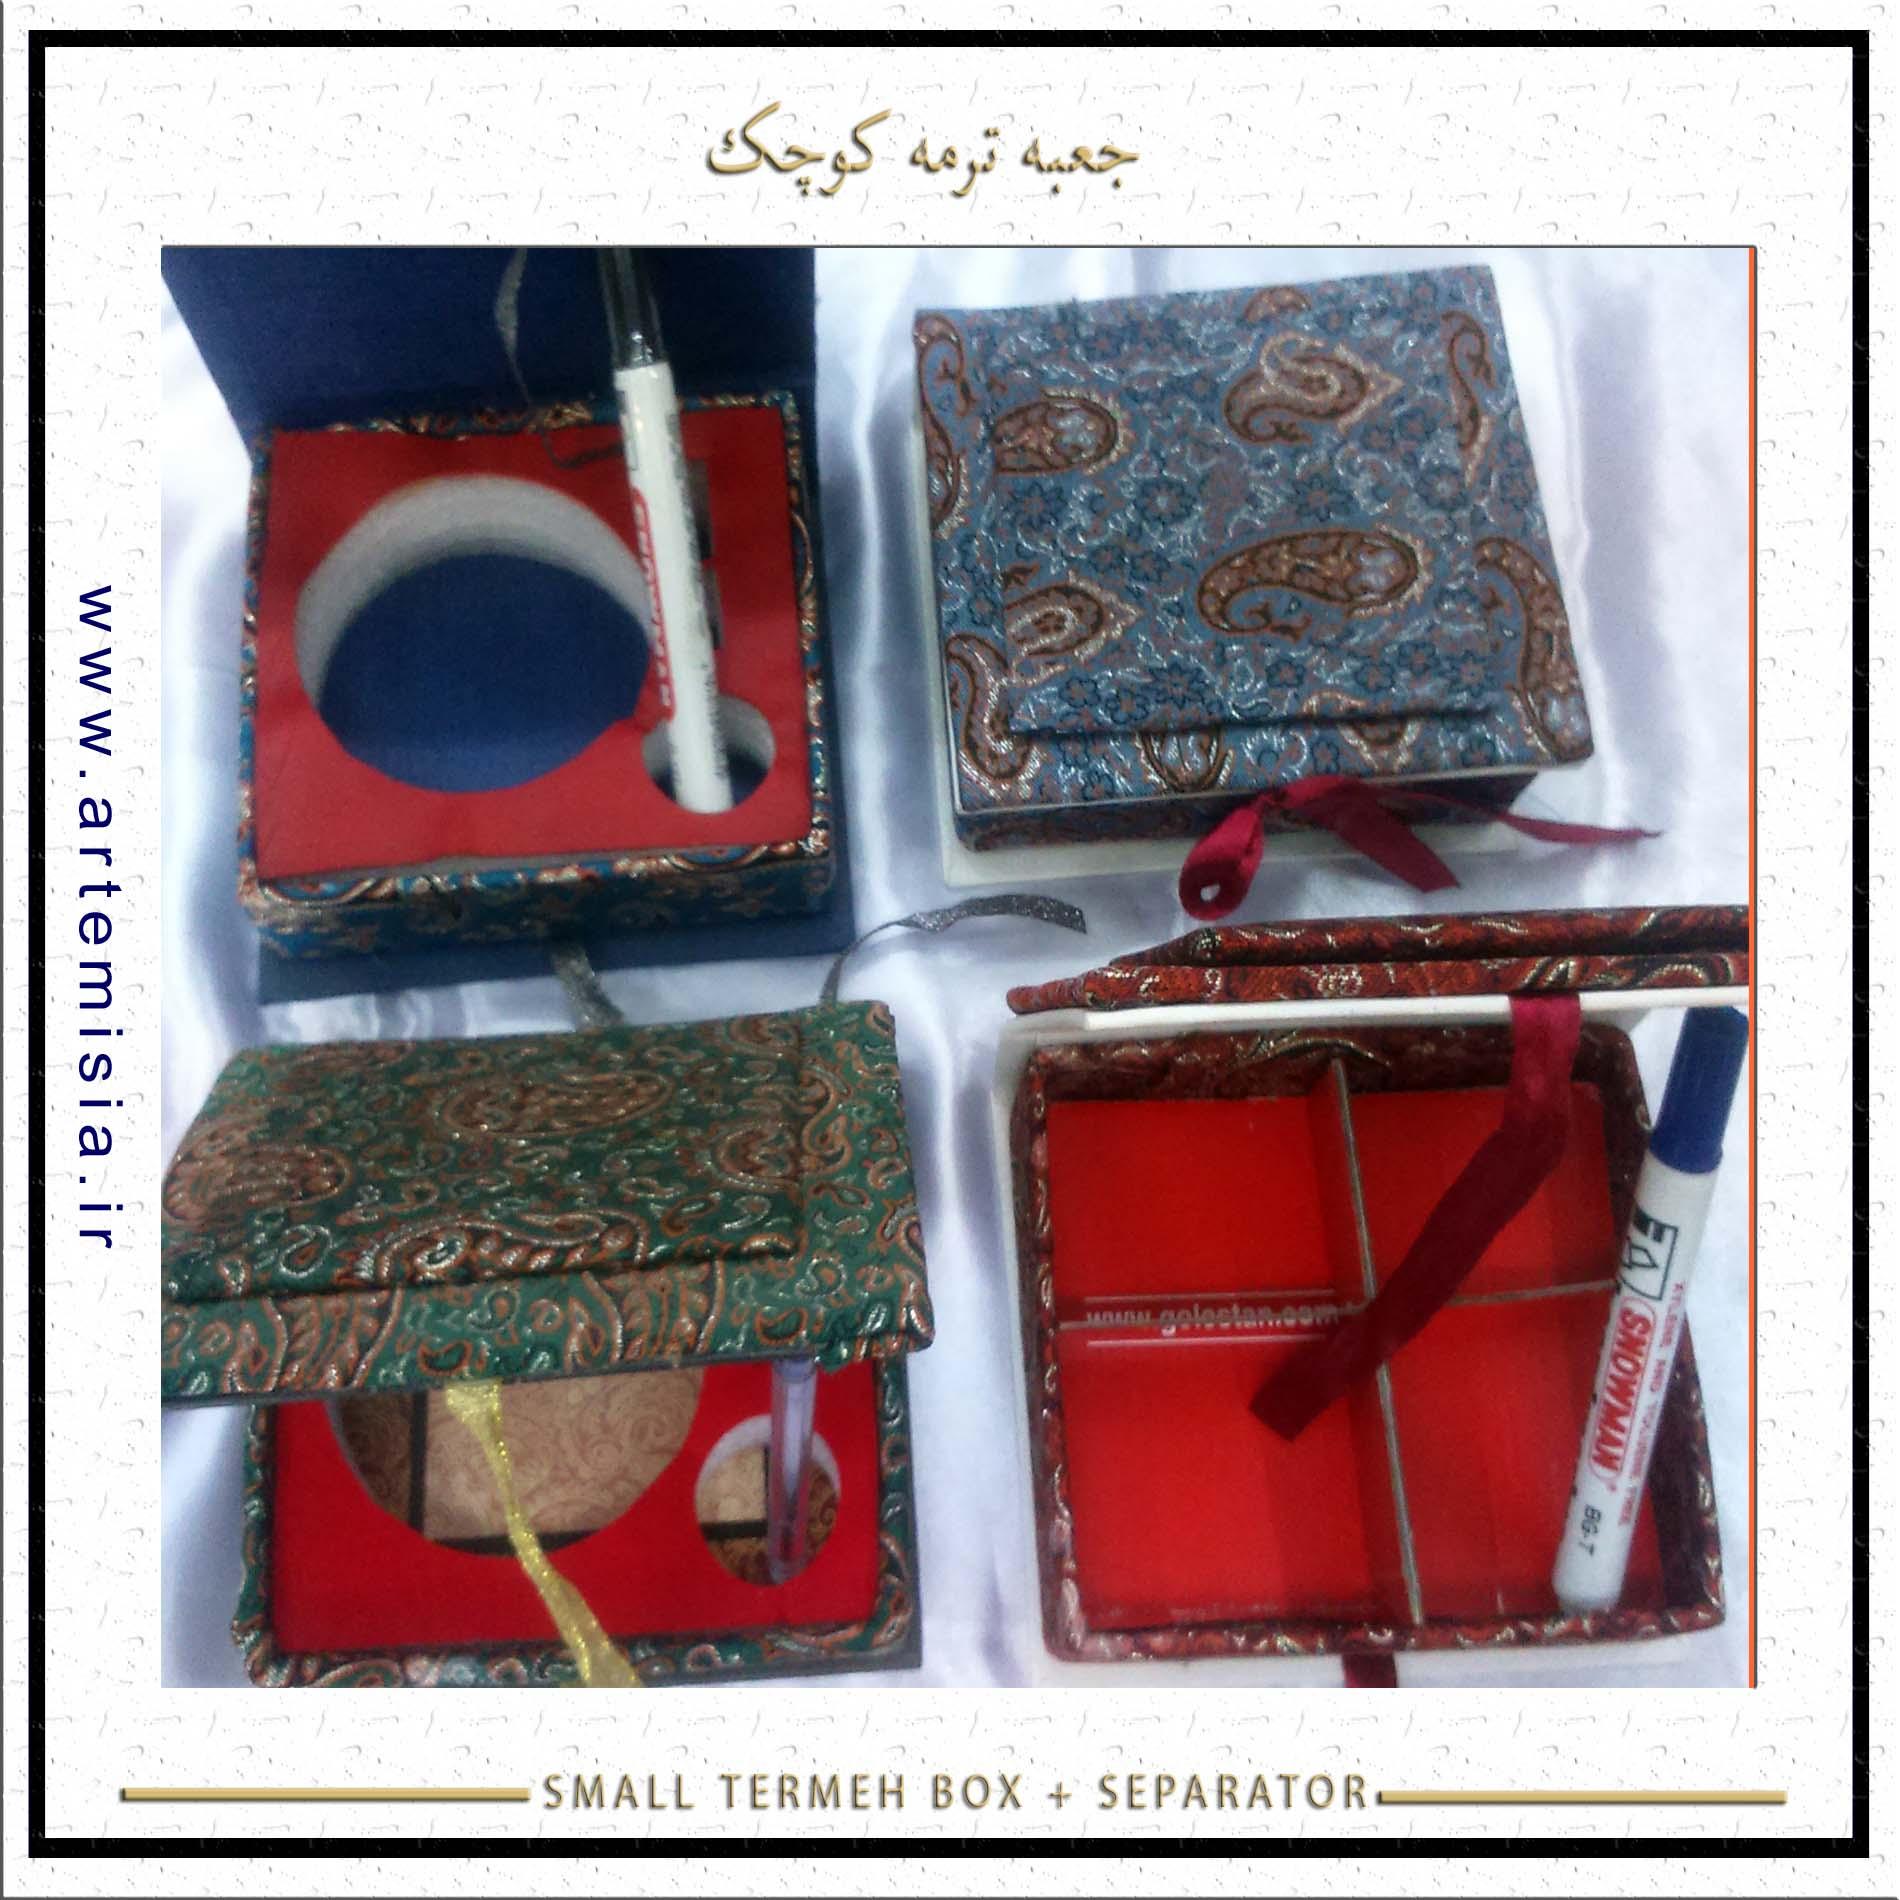 Small Termeh Box